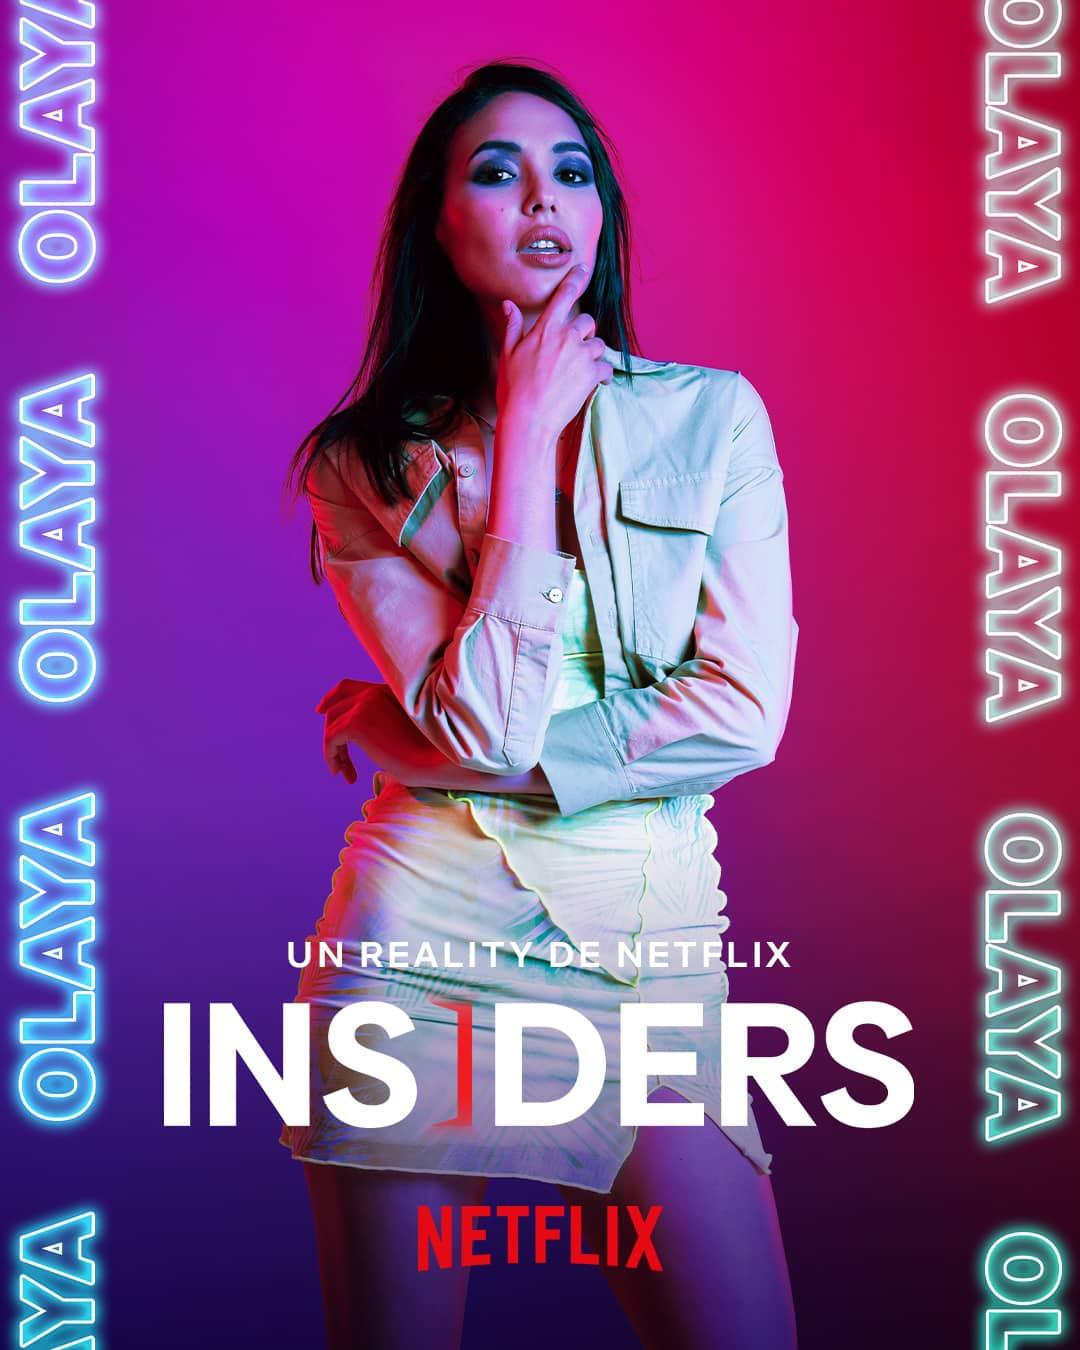 Olaya (21), 'Insiders'